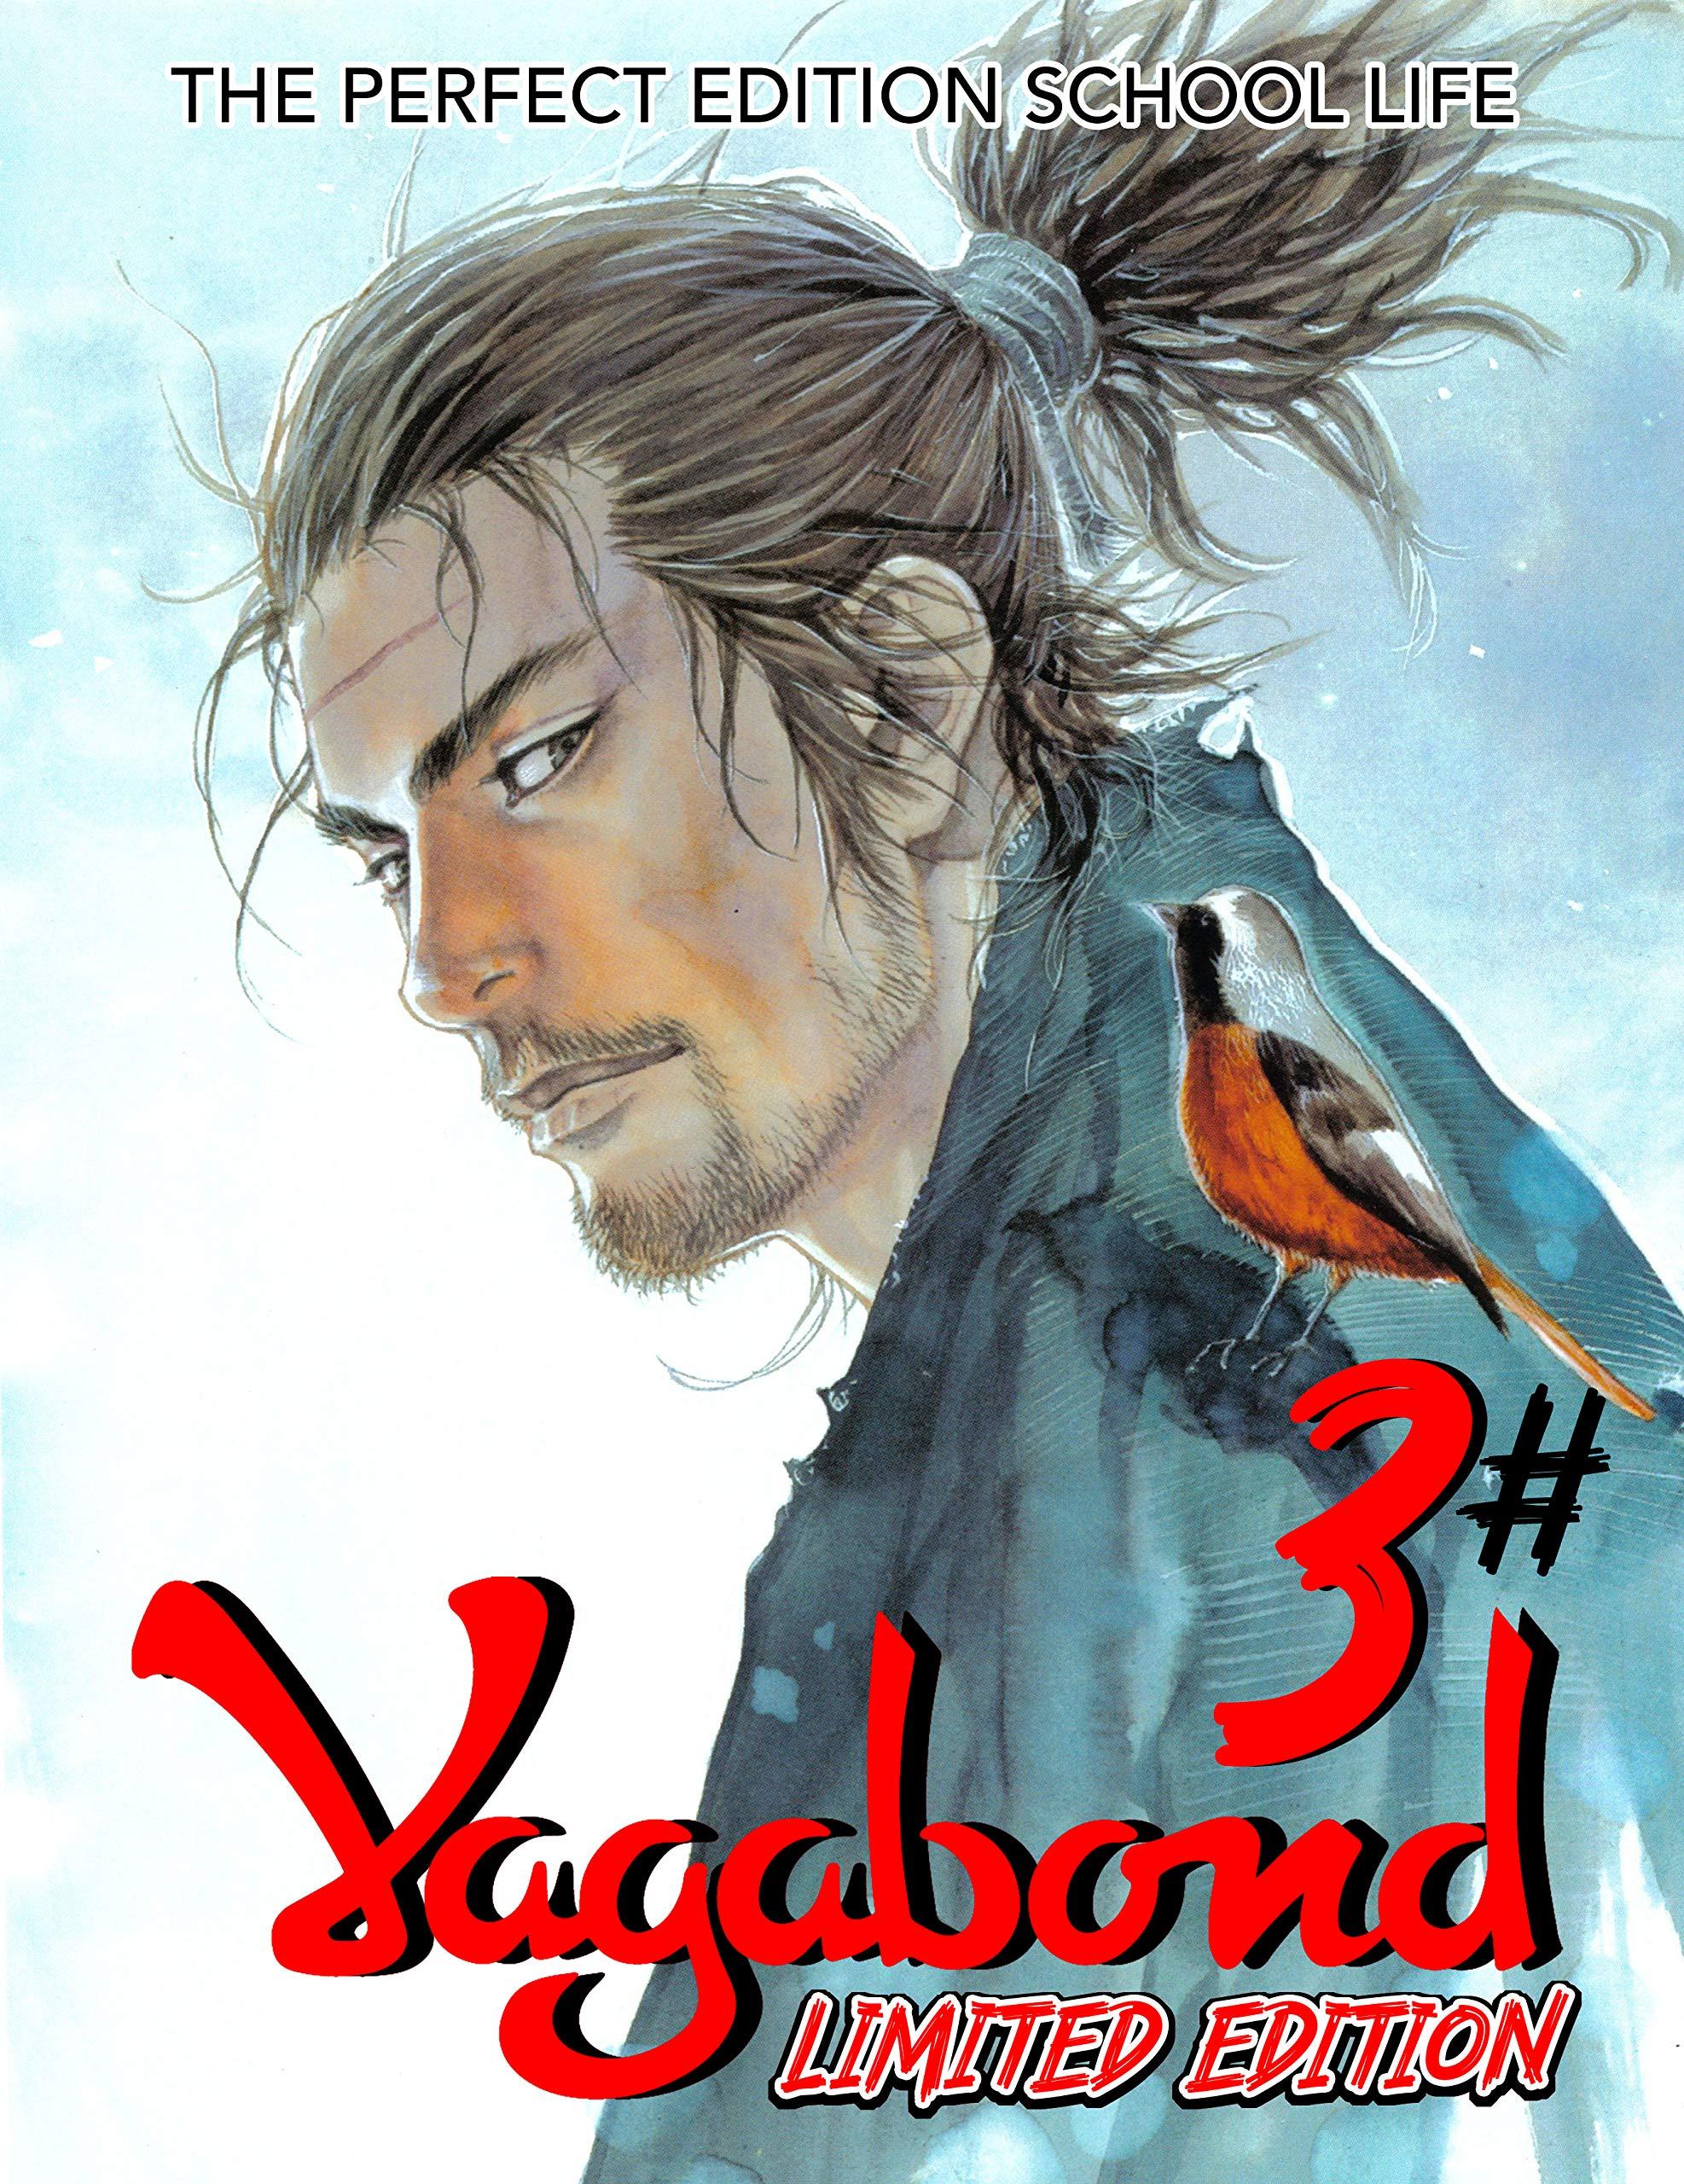 The Perfect Edition School life Manga Vagabond Limited Edition: New Releases Vagabond Volume 3